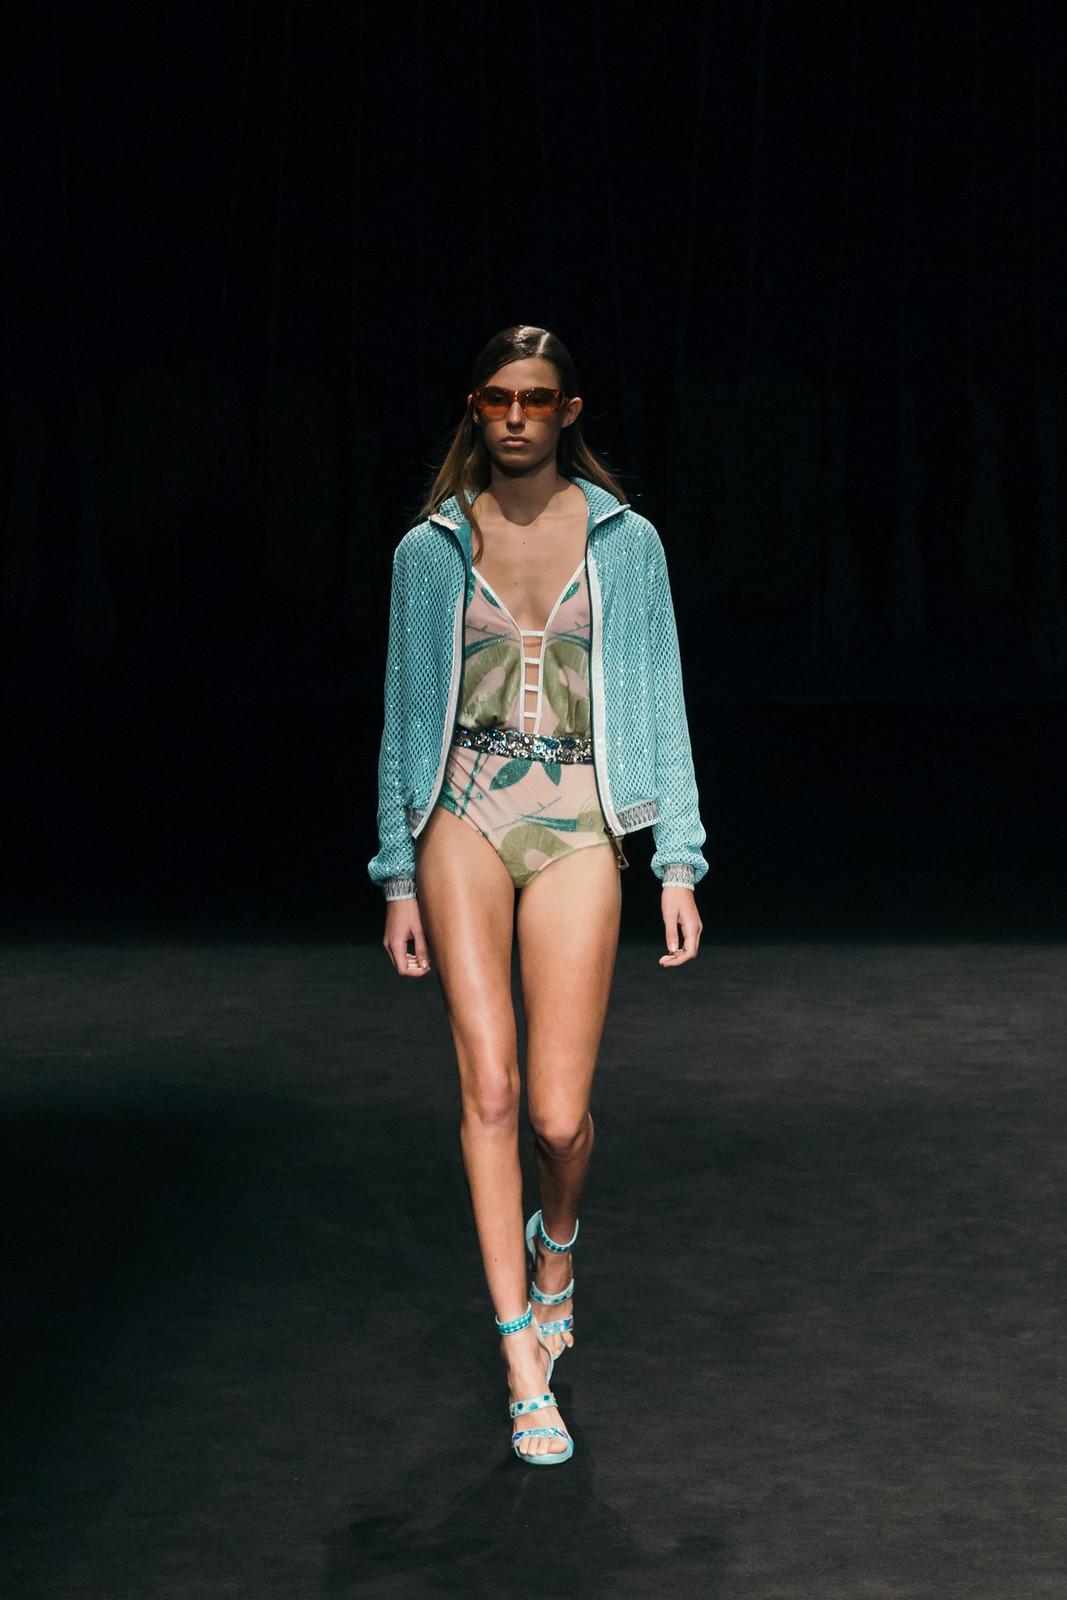 Jessie Chanes - Seams for a desire - 080 Bacelona Fashion #080bcnfasion -5